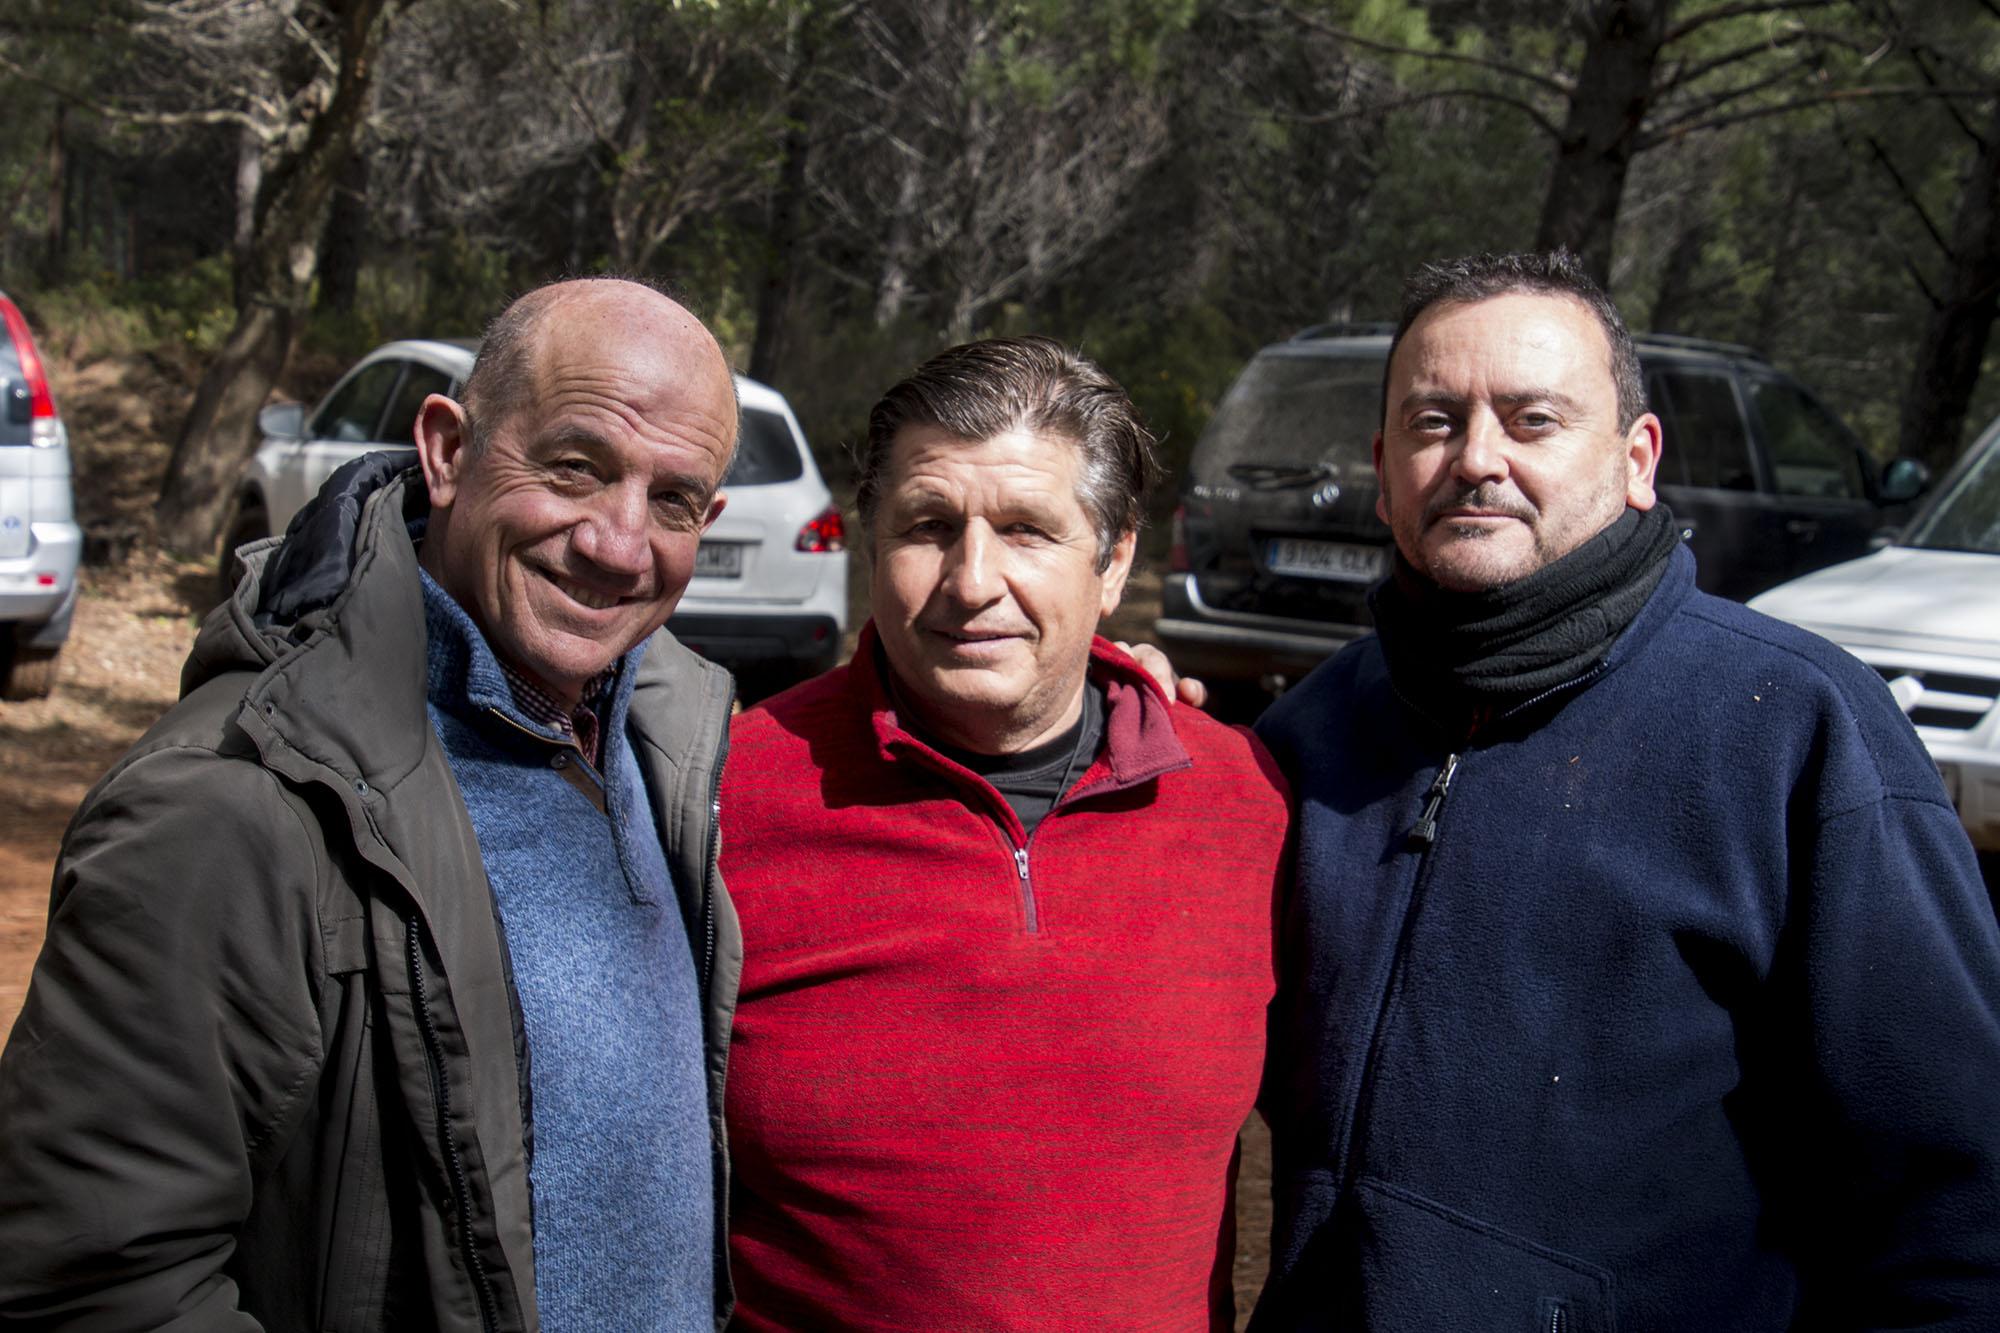 Antonio Martín Chicote, José Luis Ojeda e Ildefonso Navarro Luengo